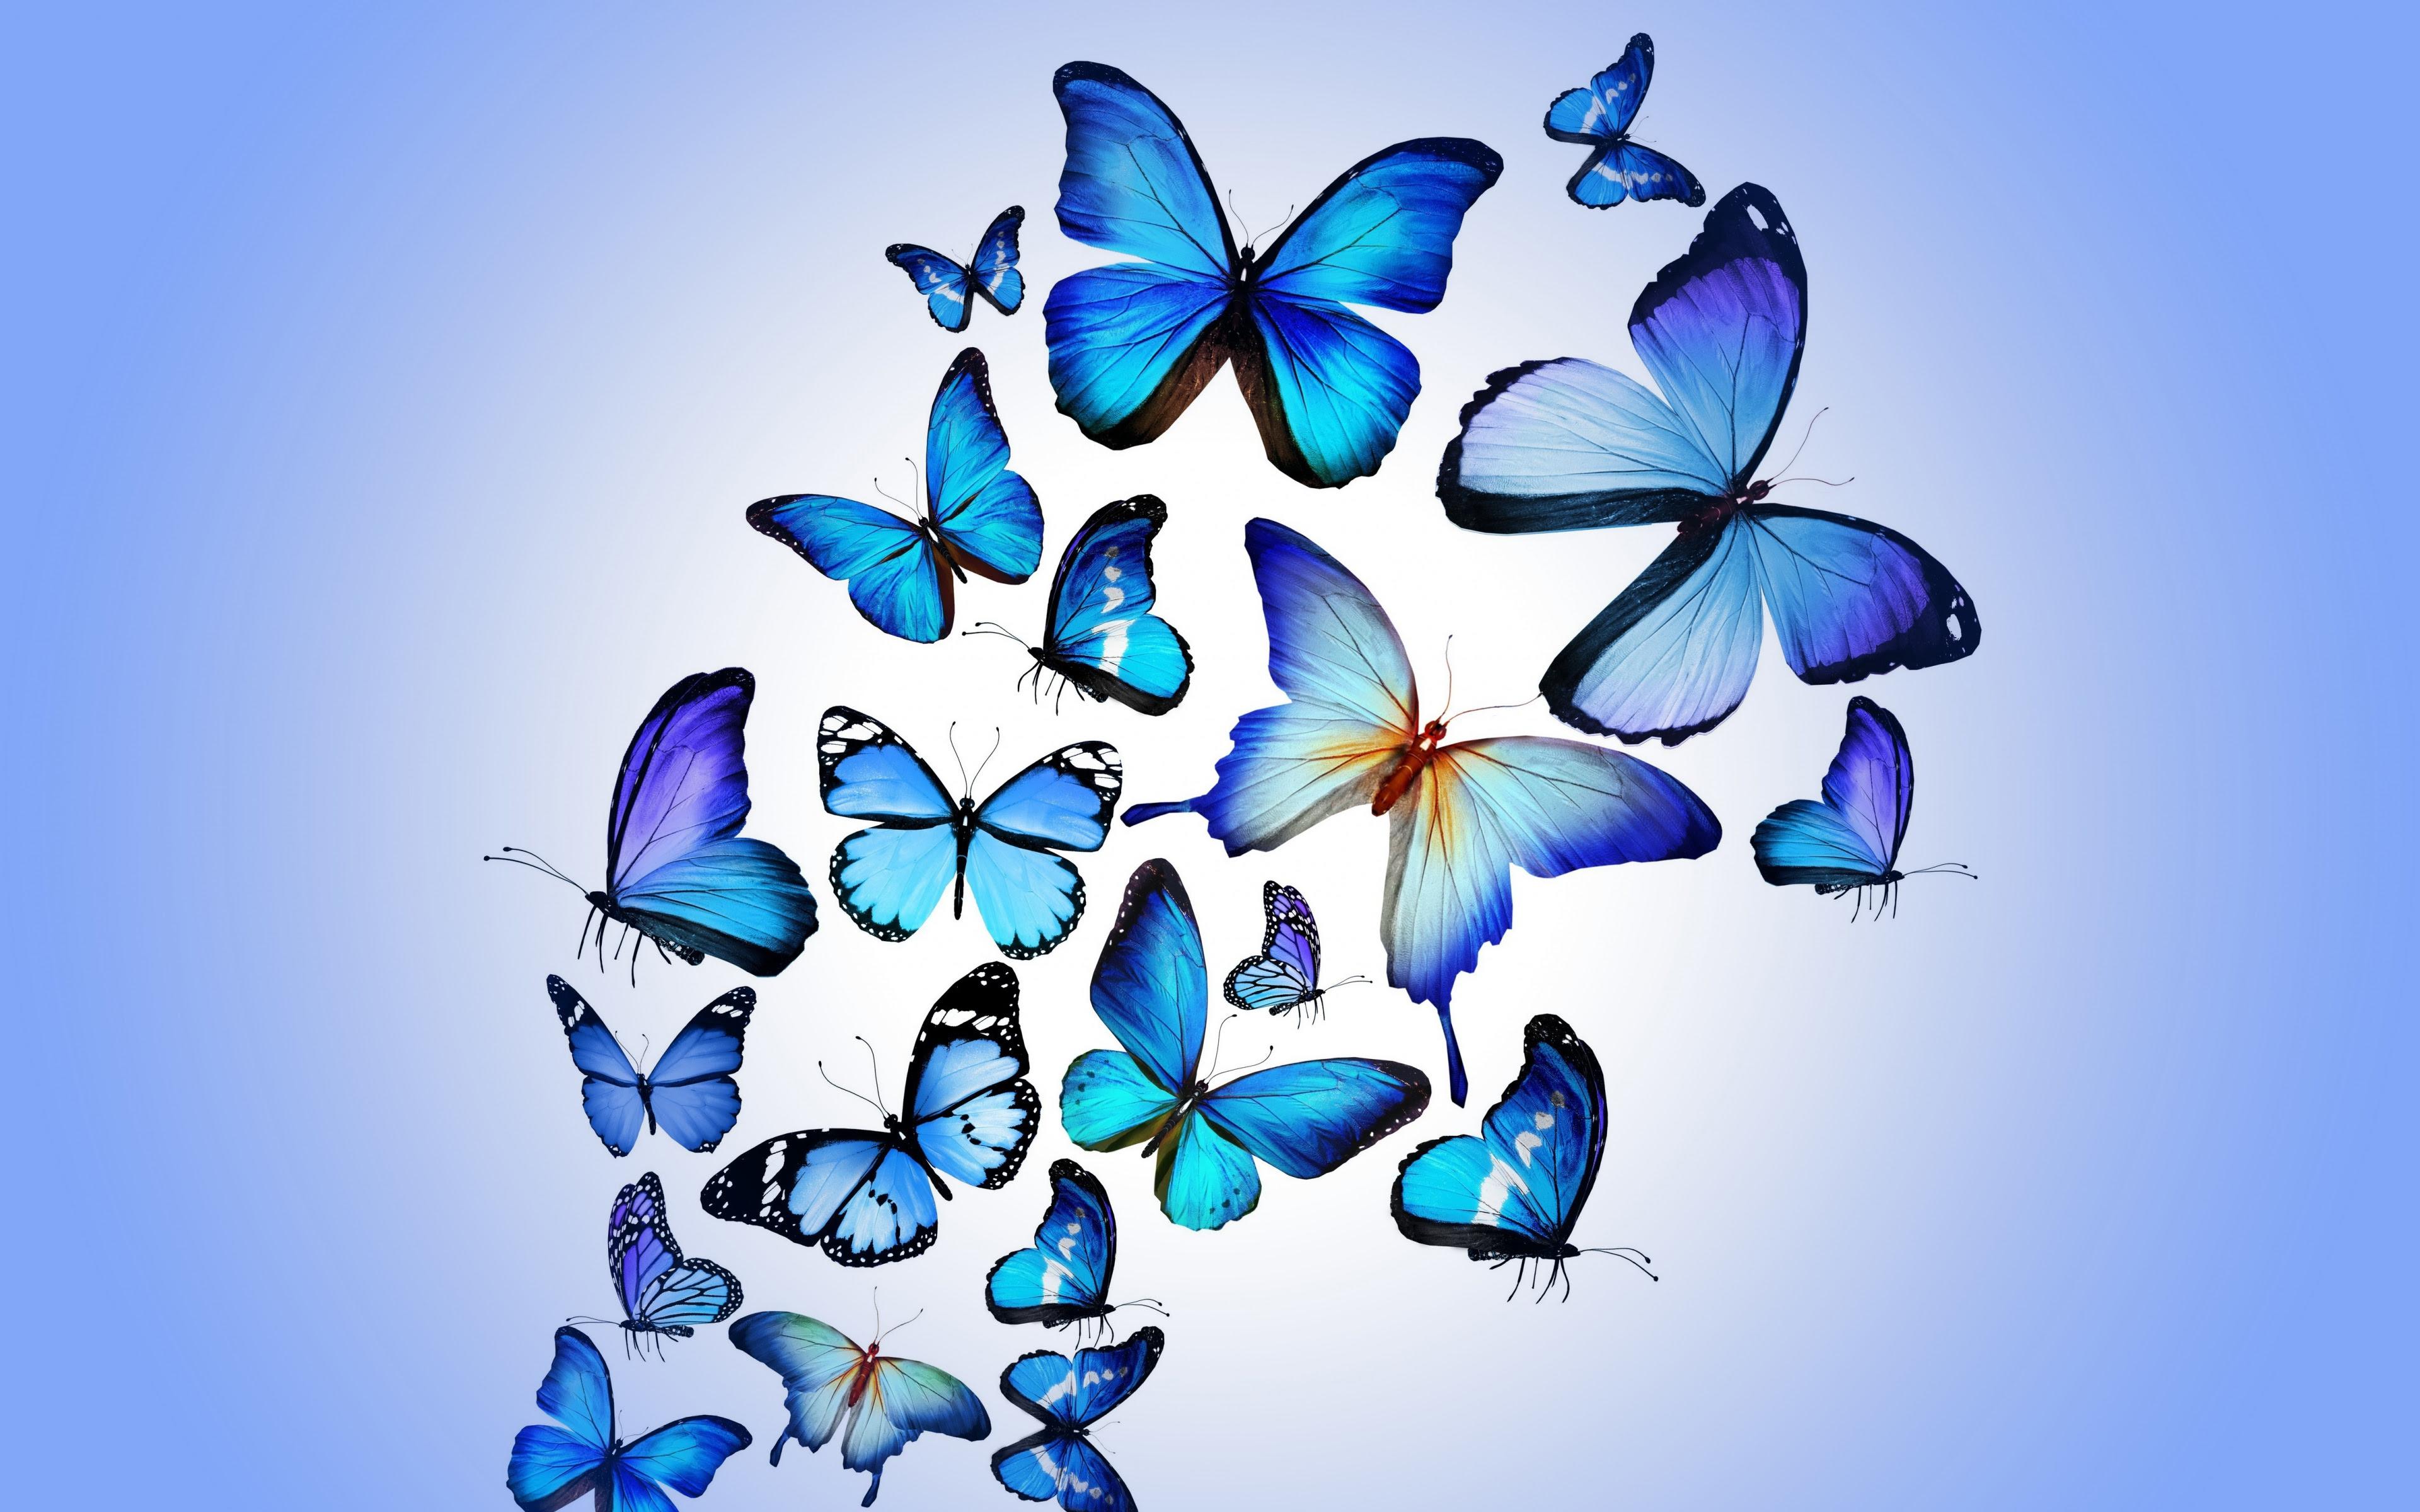 Butterfly Art, HD Artist, 4k Wallpapers, Images ...